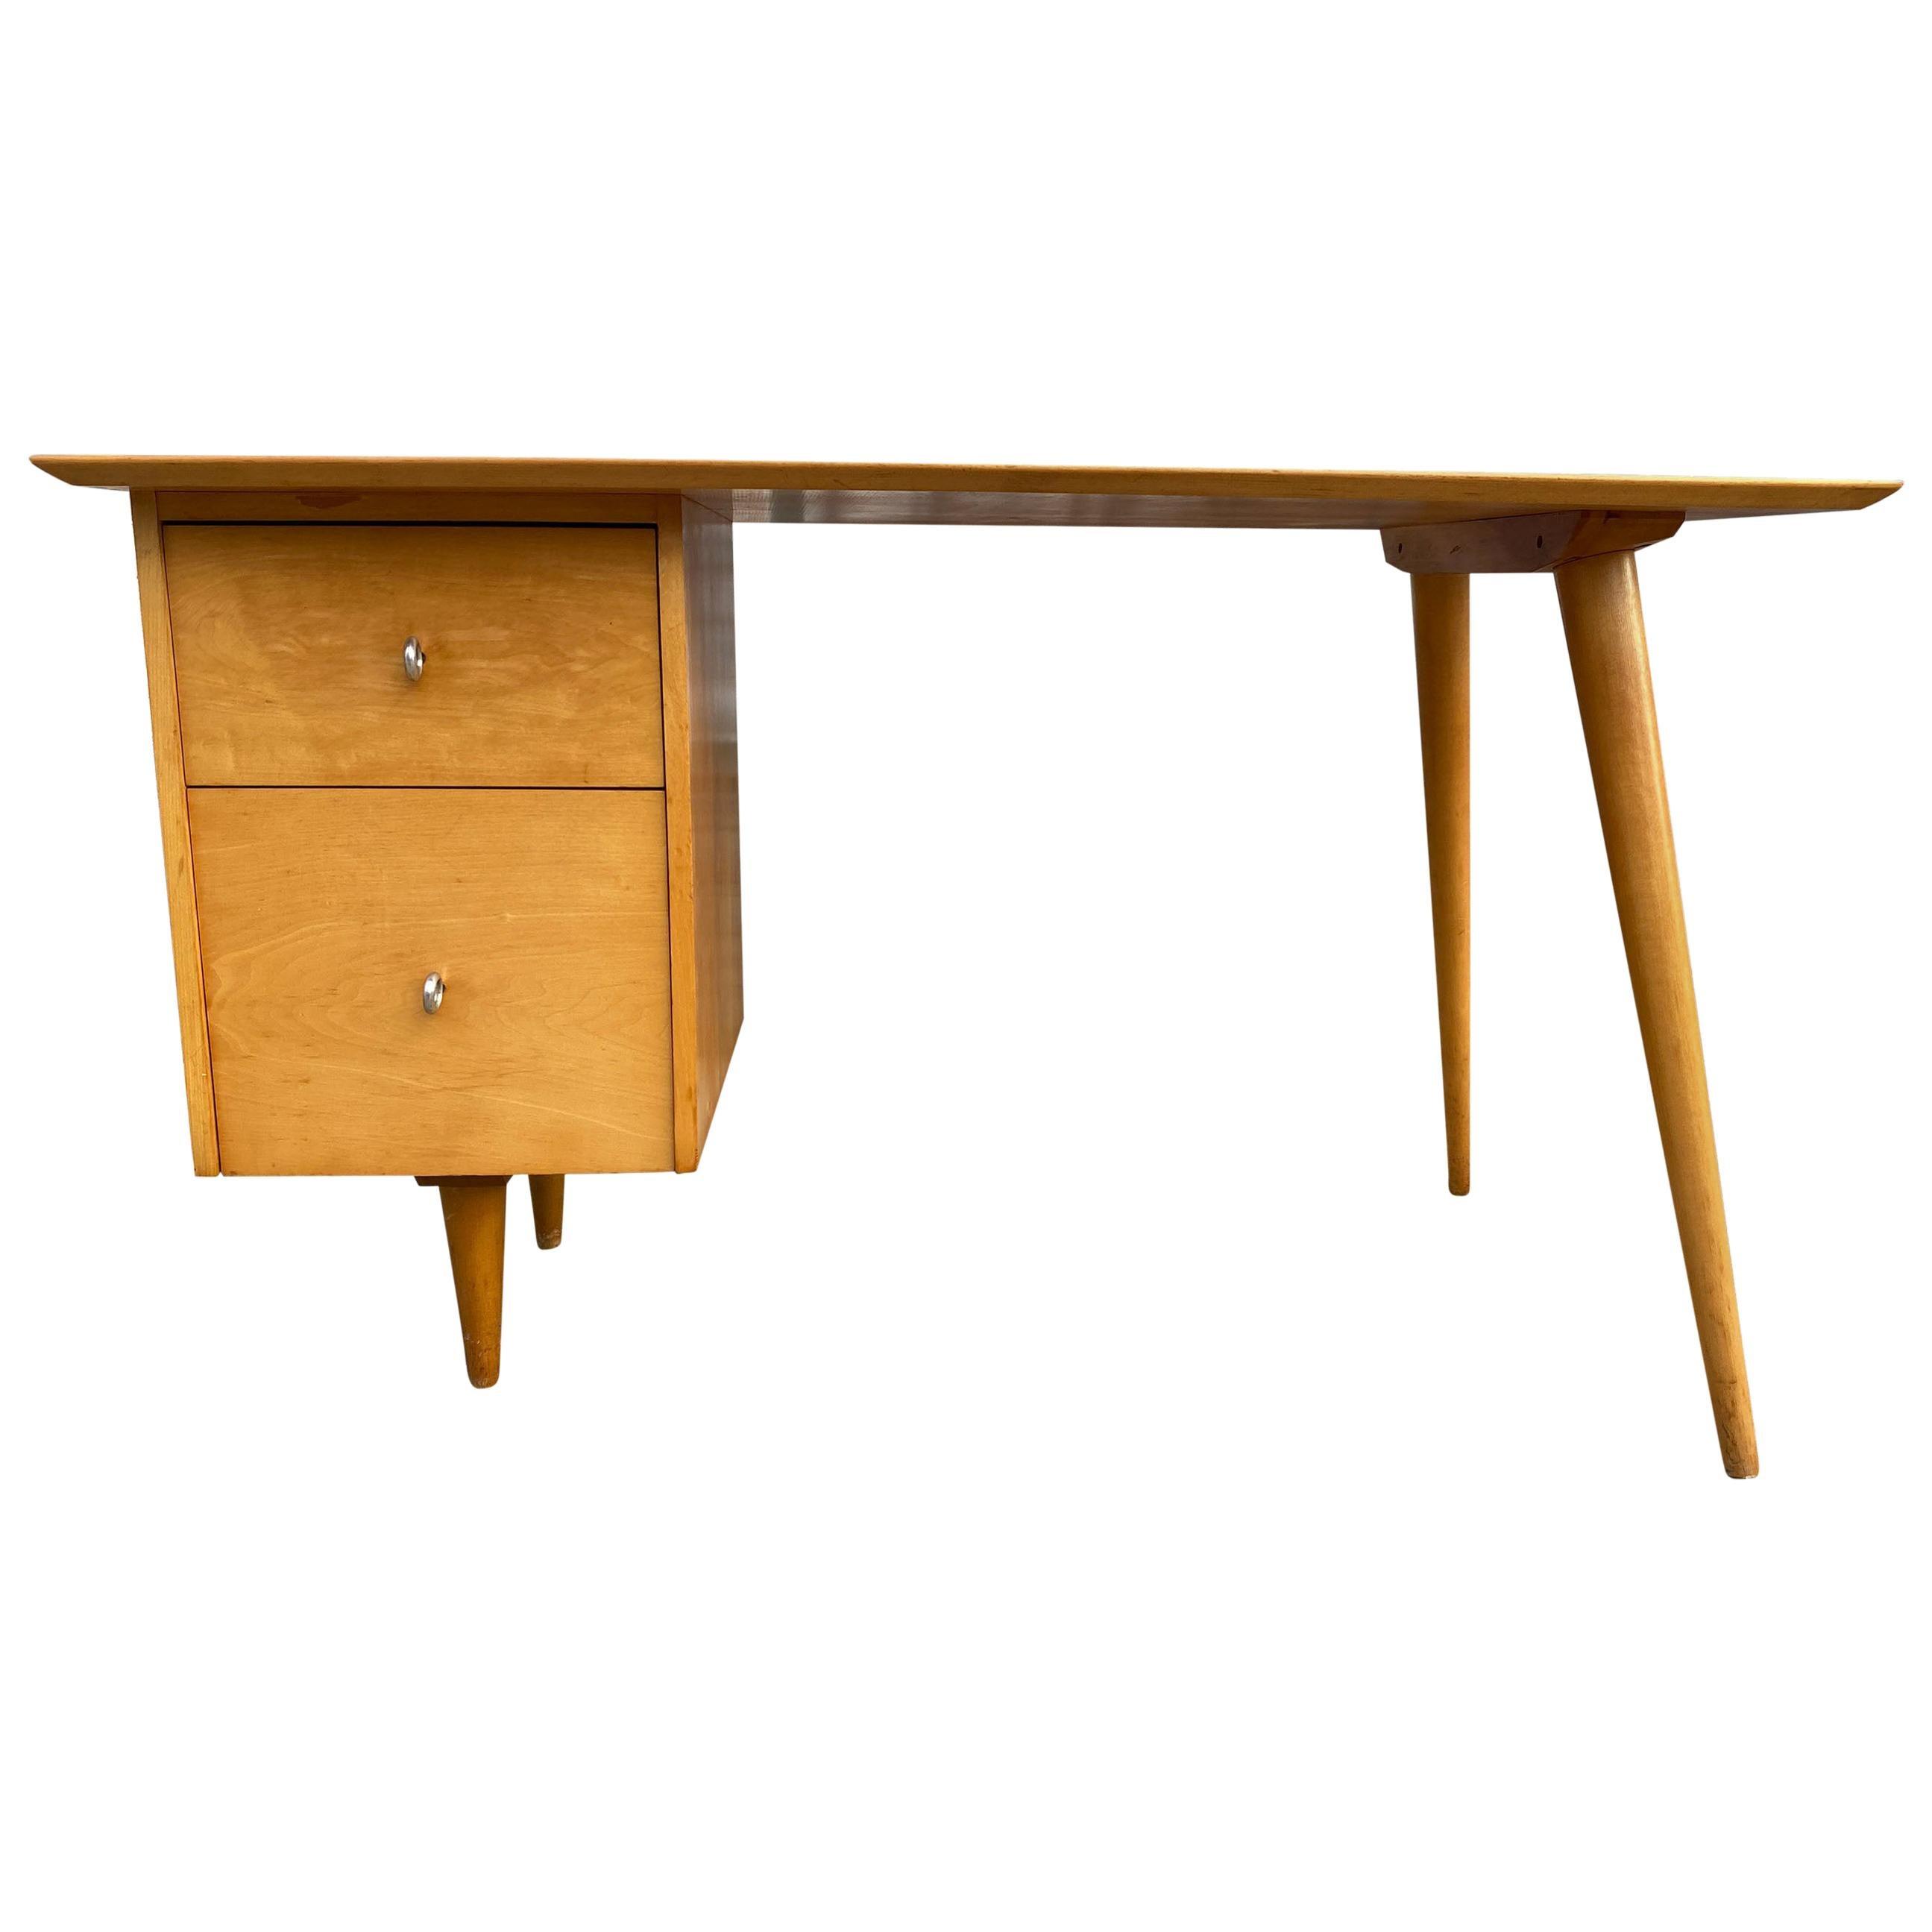 Midcentury Paul McCobb #1560 Double Drawer Desk Blonde Maple Finish Ring pulls